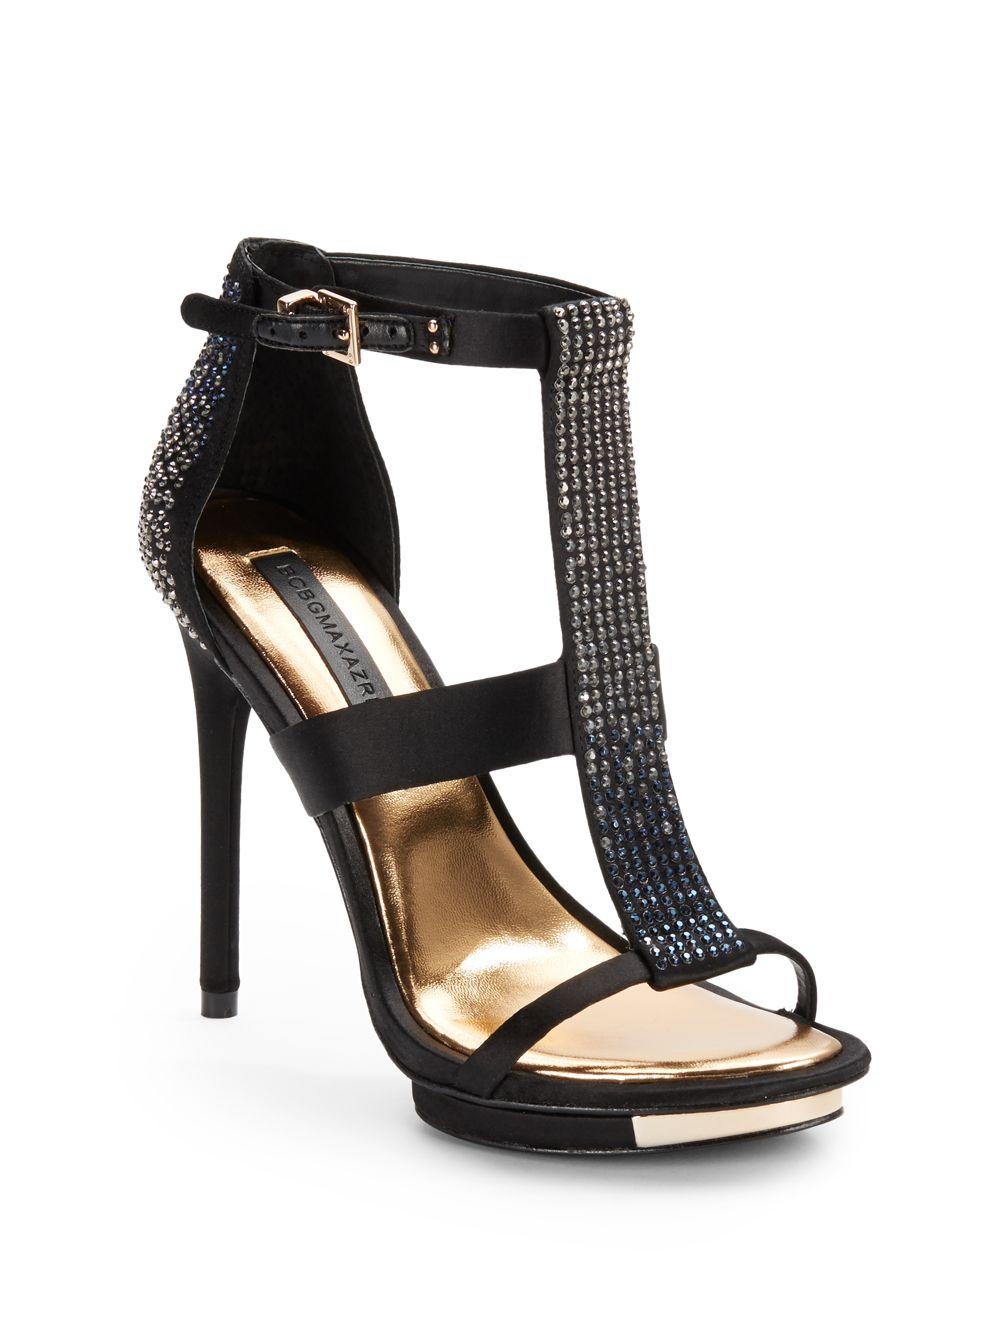 cf3ee97e3 Lyst - BCBGMAXAZRIA Lilie Jeweled High Heel Sandals in Black